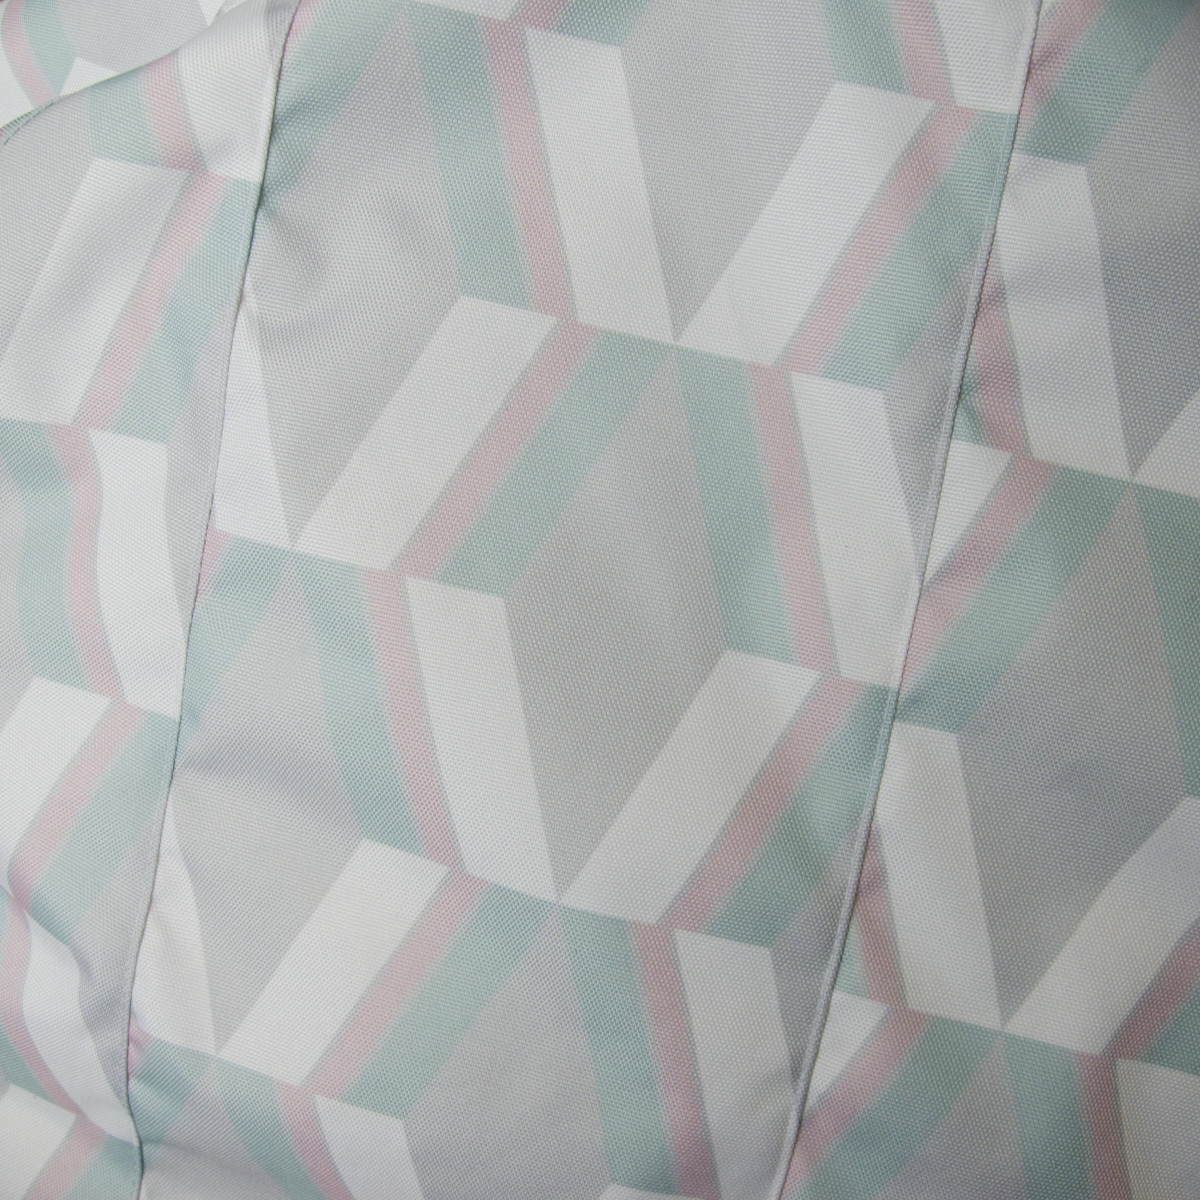 Кресло-Груша 120Х70Х60 Цвет Геометрия